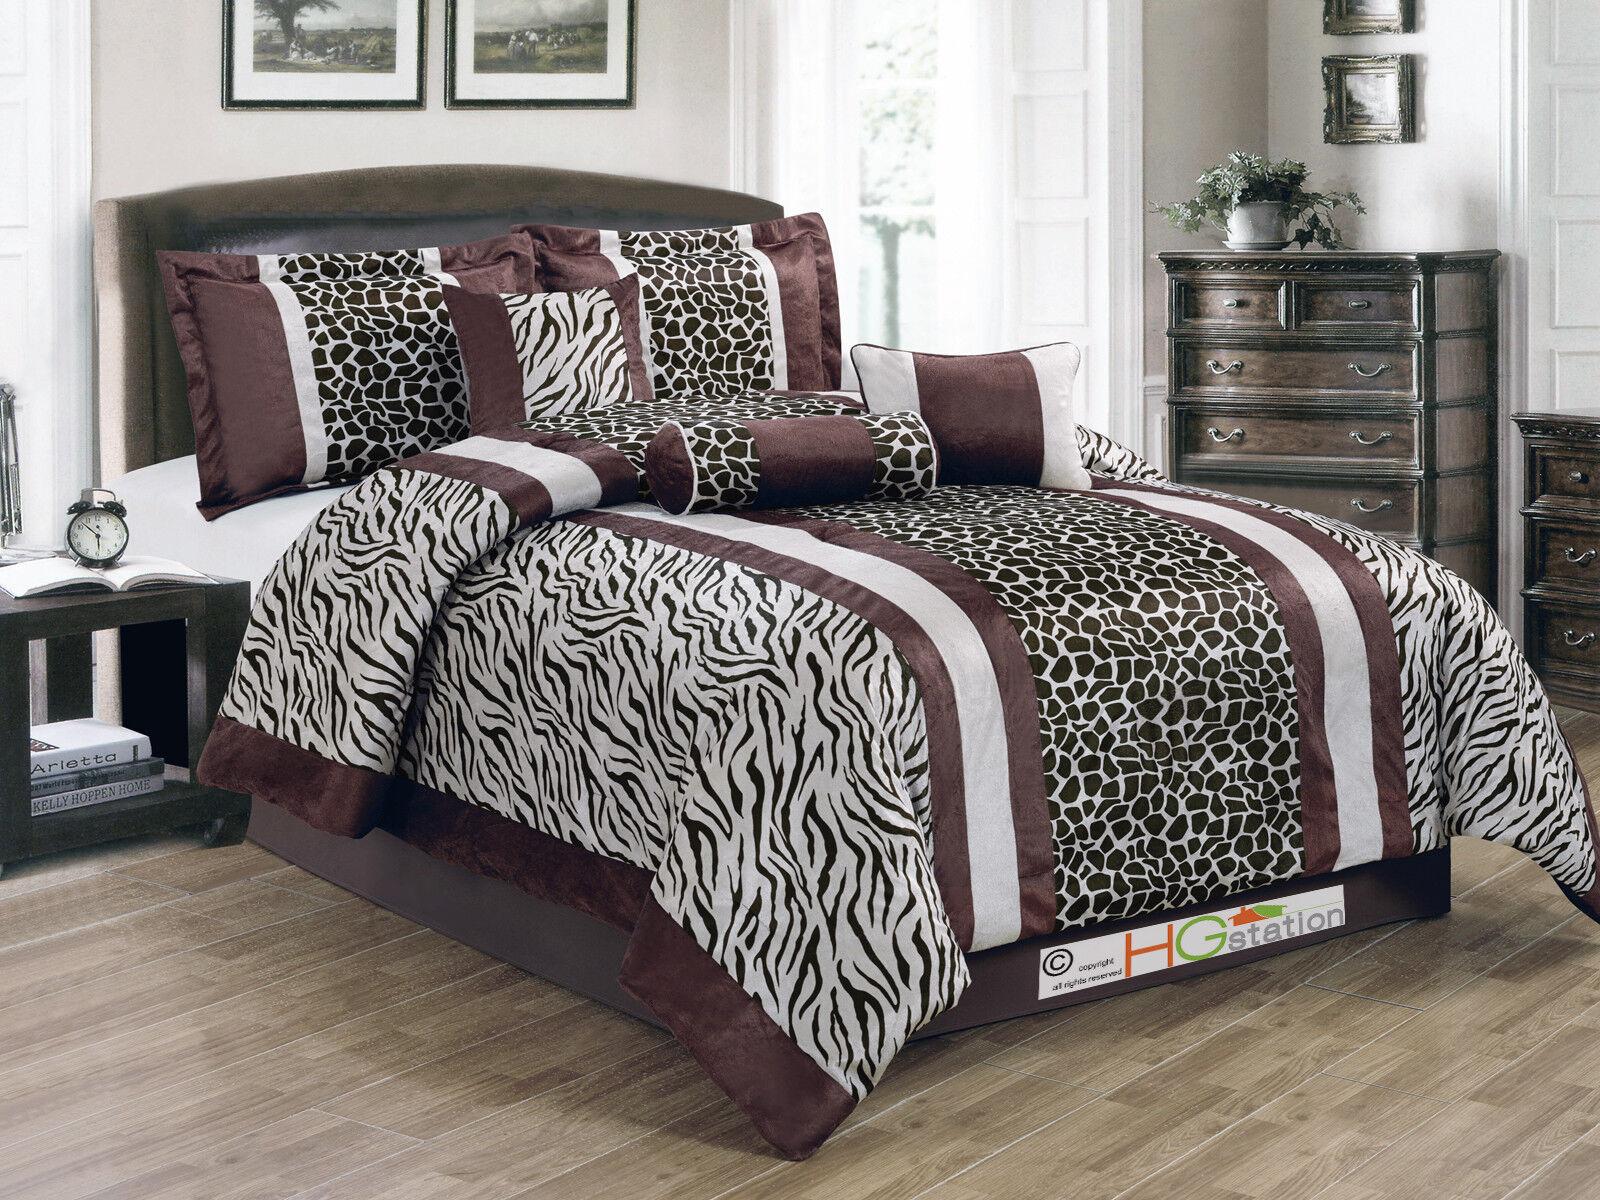 11 Faux Fur Safari Stripe Zebra Giraffe Comforter Curtain Set Coffee braun Queen